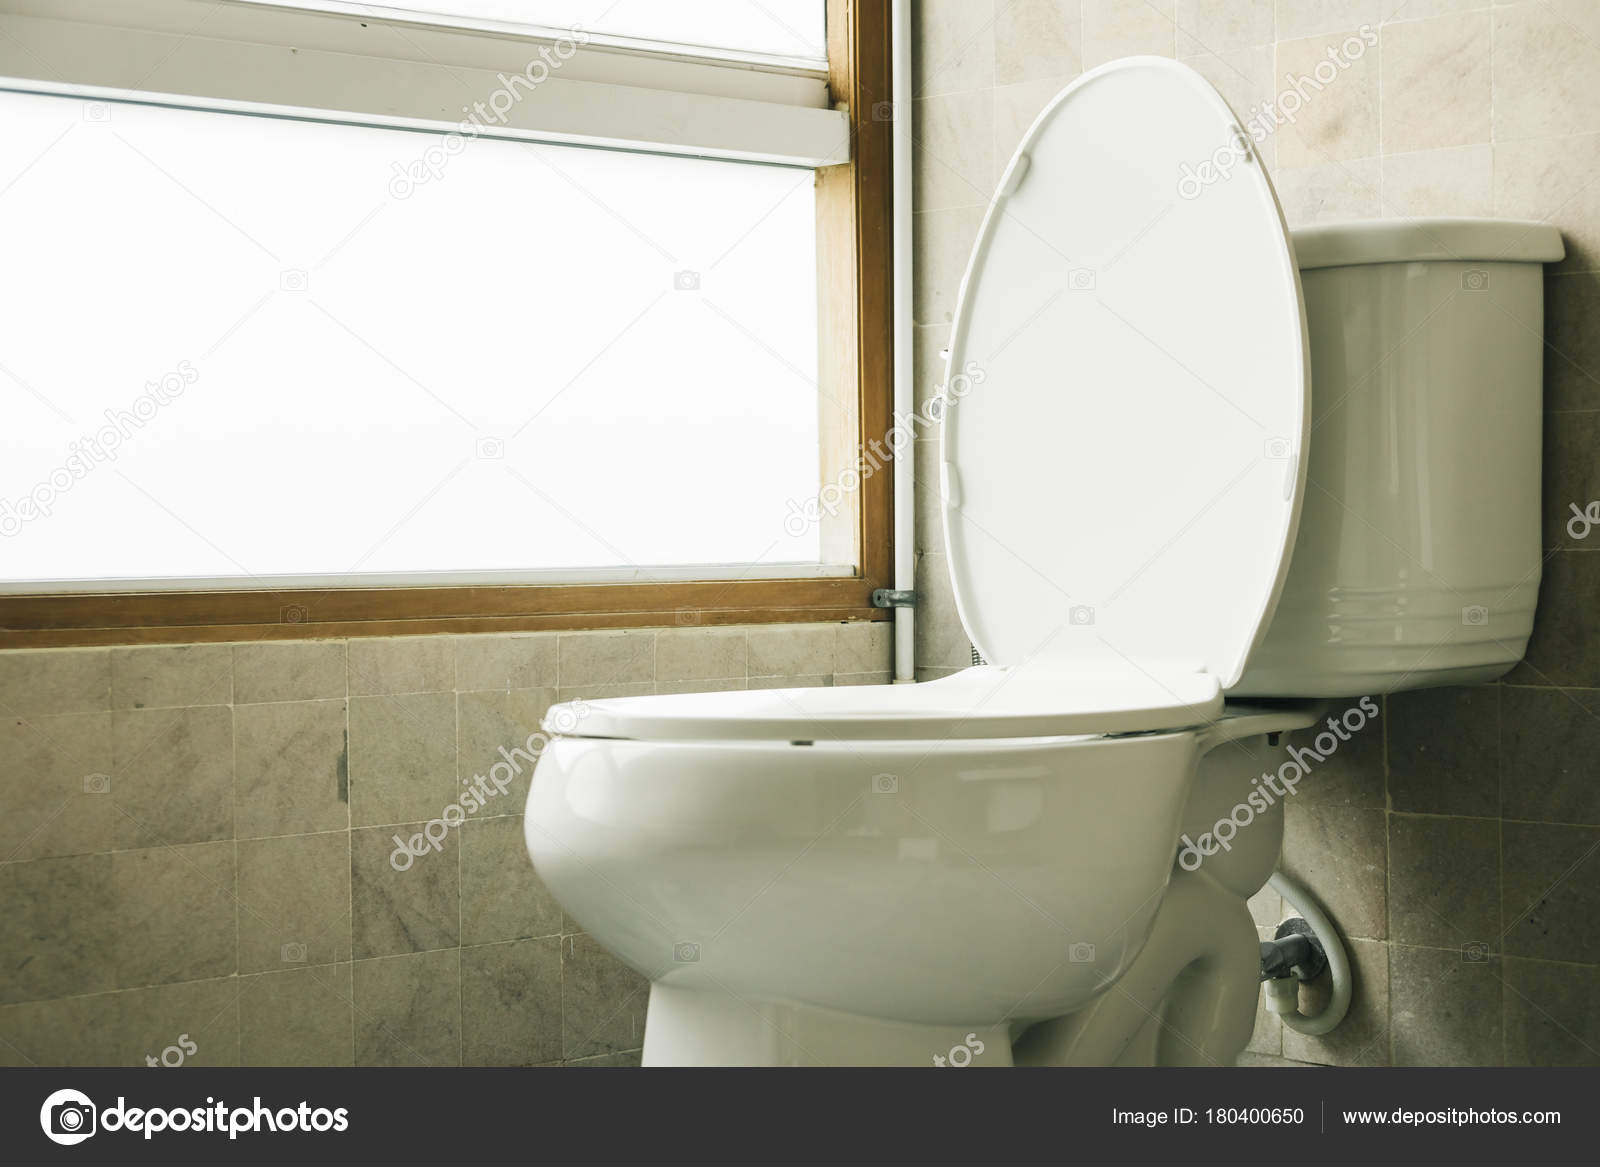 Toilet stoel decoratie in de badkamer — Stockfoto © mrsiraphol ...